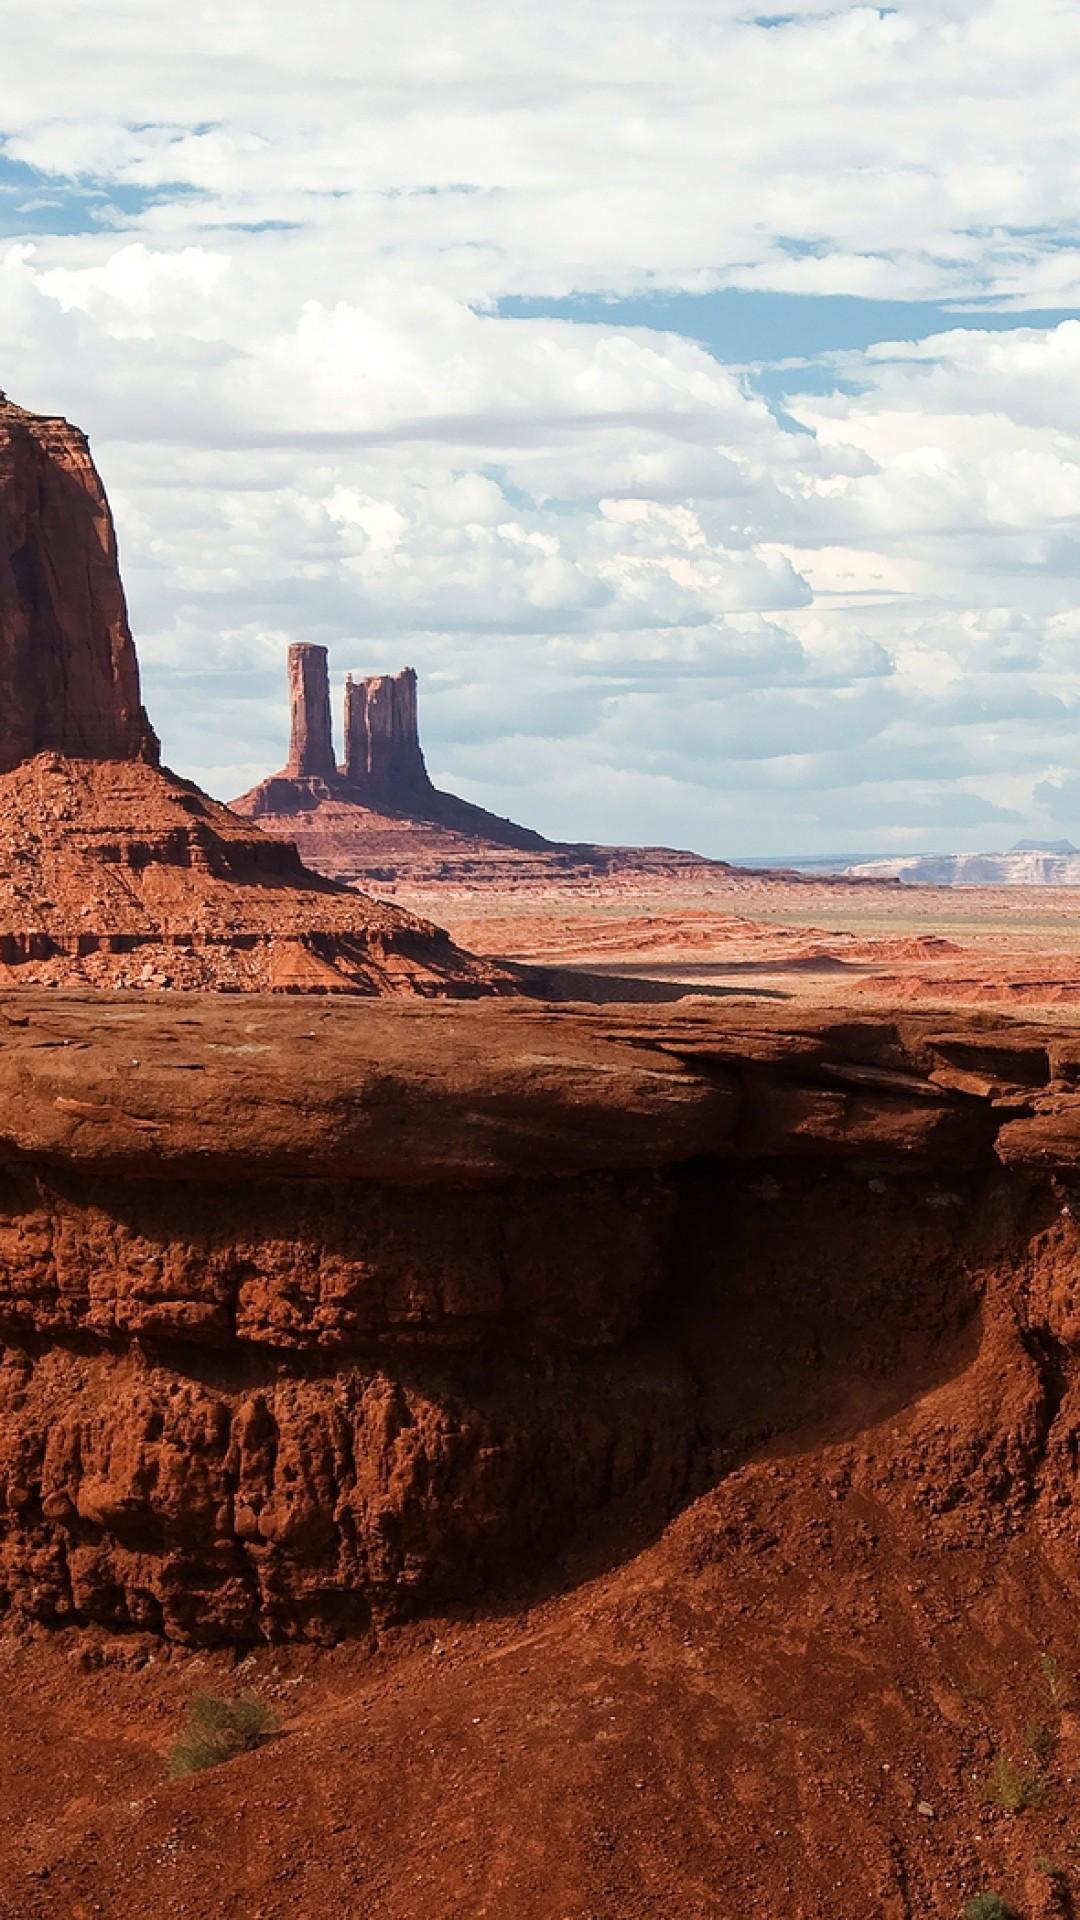 Preview wallpaper canyon, desert, horseback rider, wild west, cowboy  1080×1920